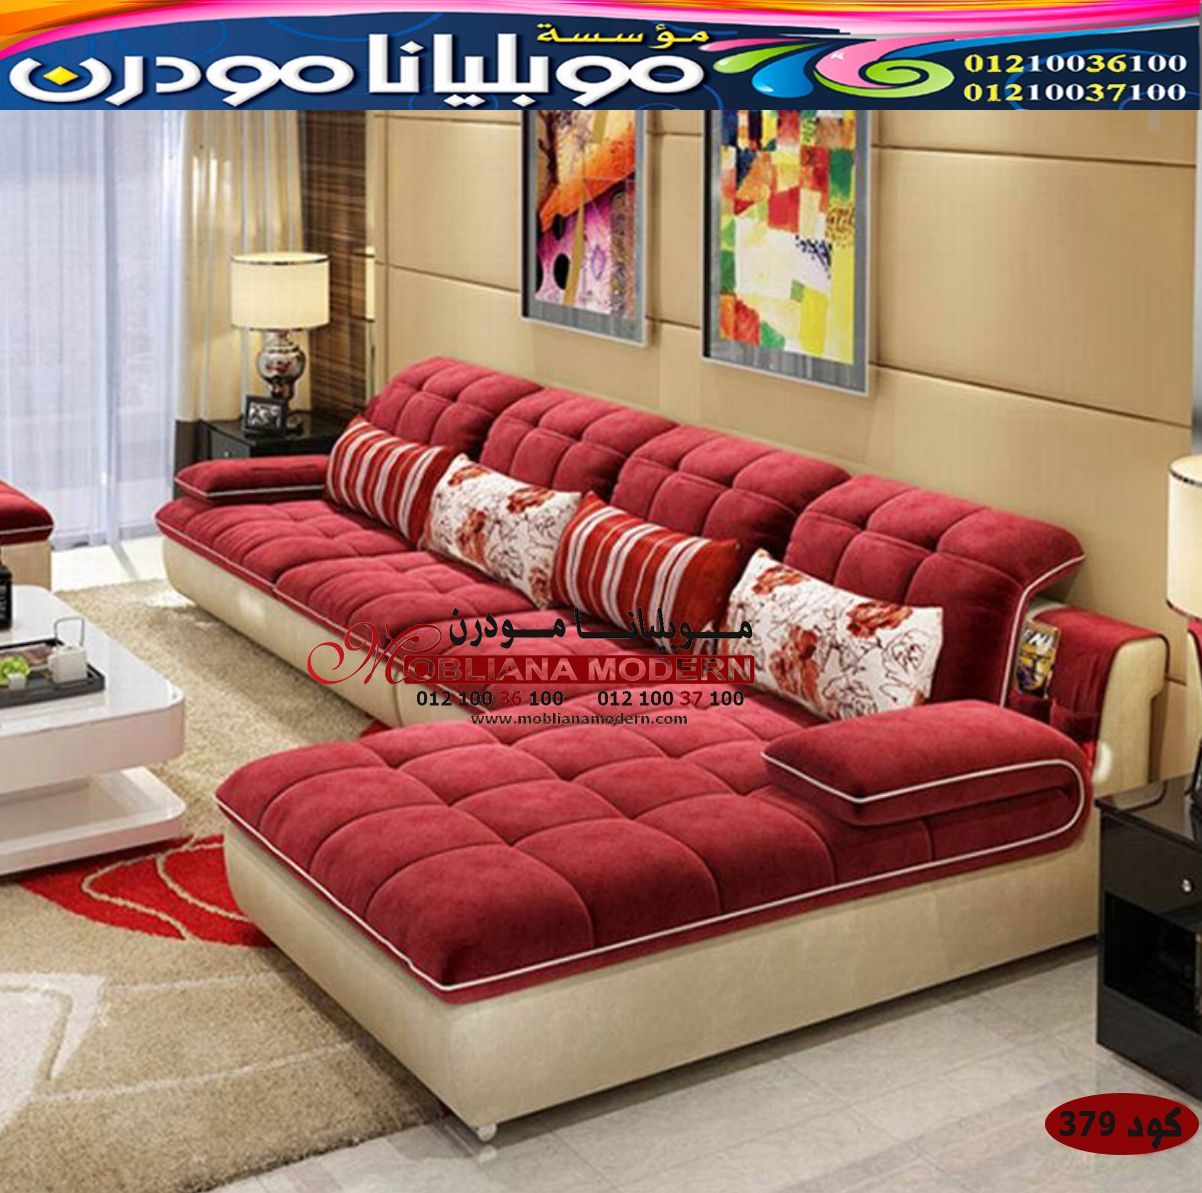 ركنات مودرن2022 معارض اثاث اكتوبر2021 معارض اثاث القاهره2020 Eclectic Living Room Colorful Eclectic Living Room Red Bedroom Walls